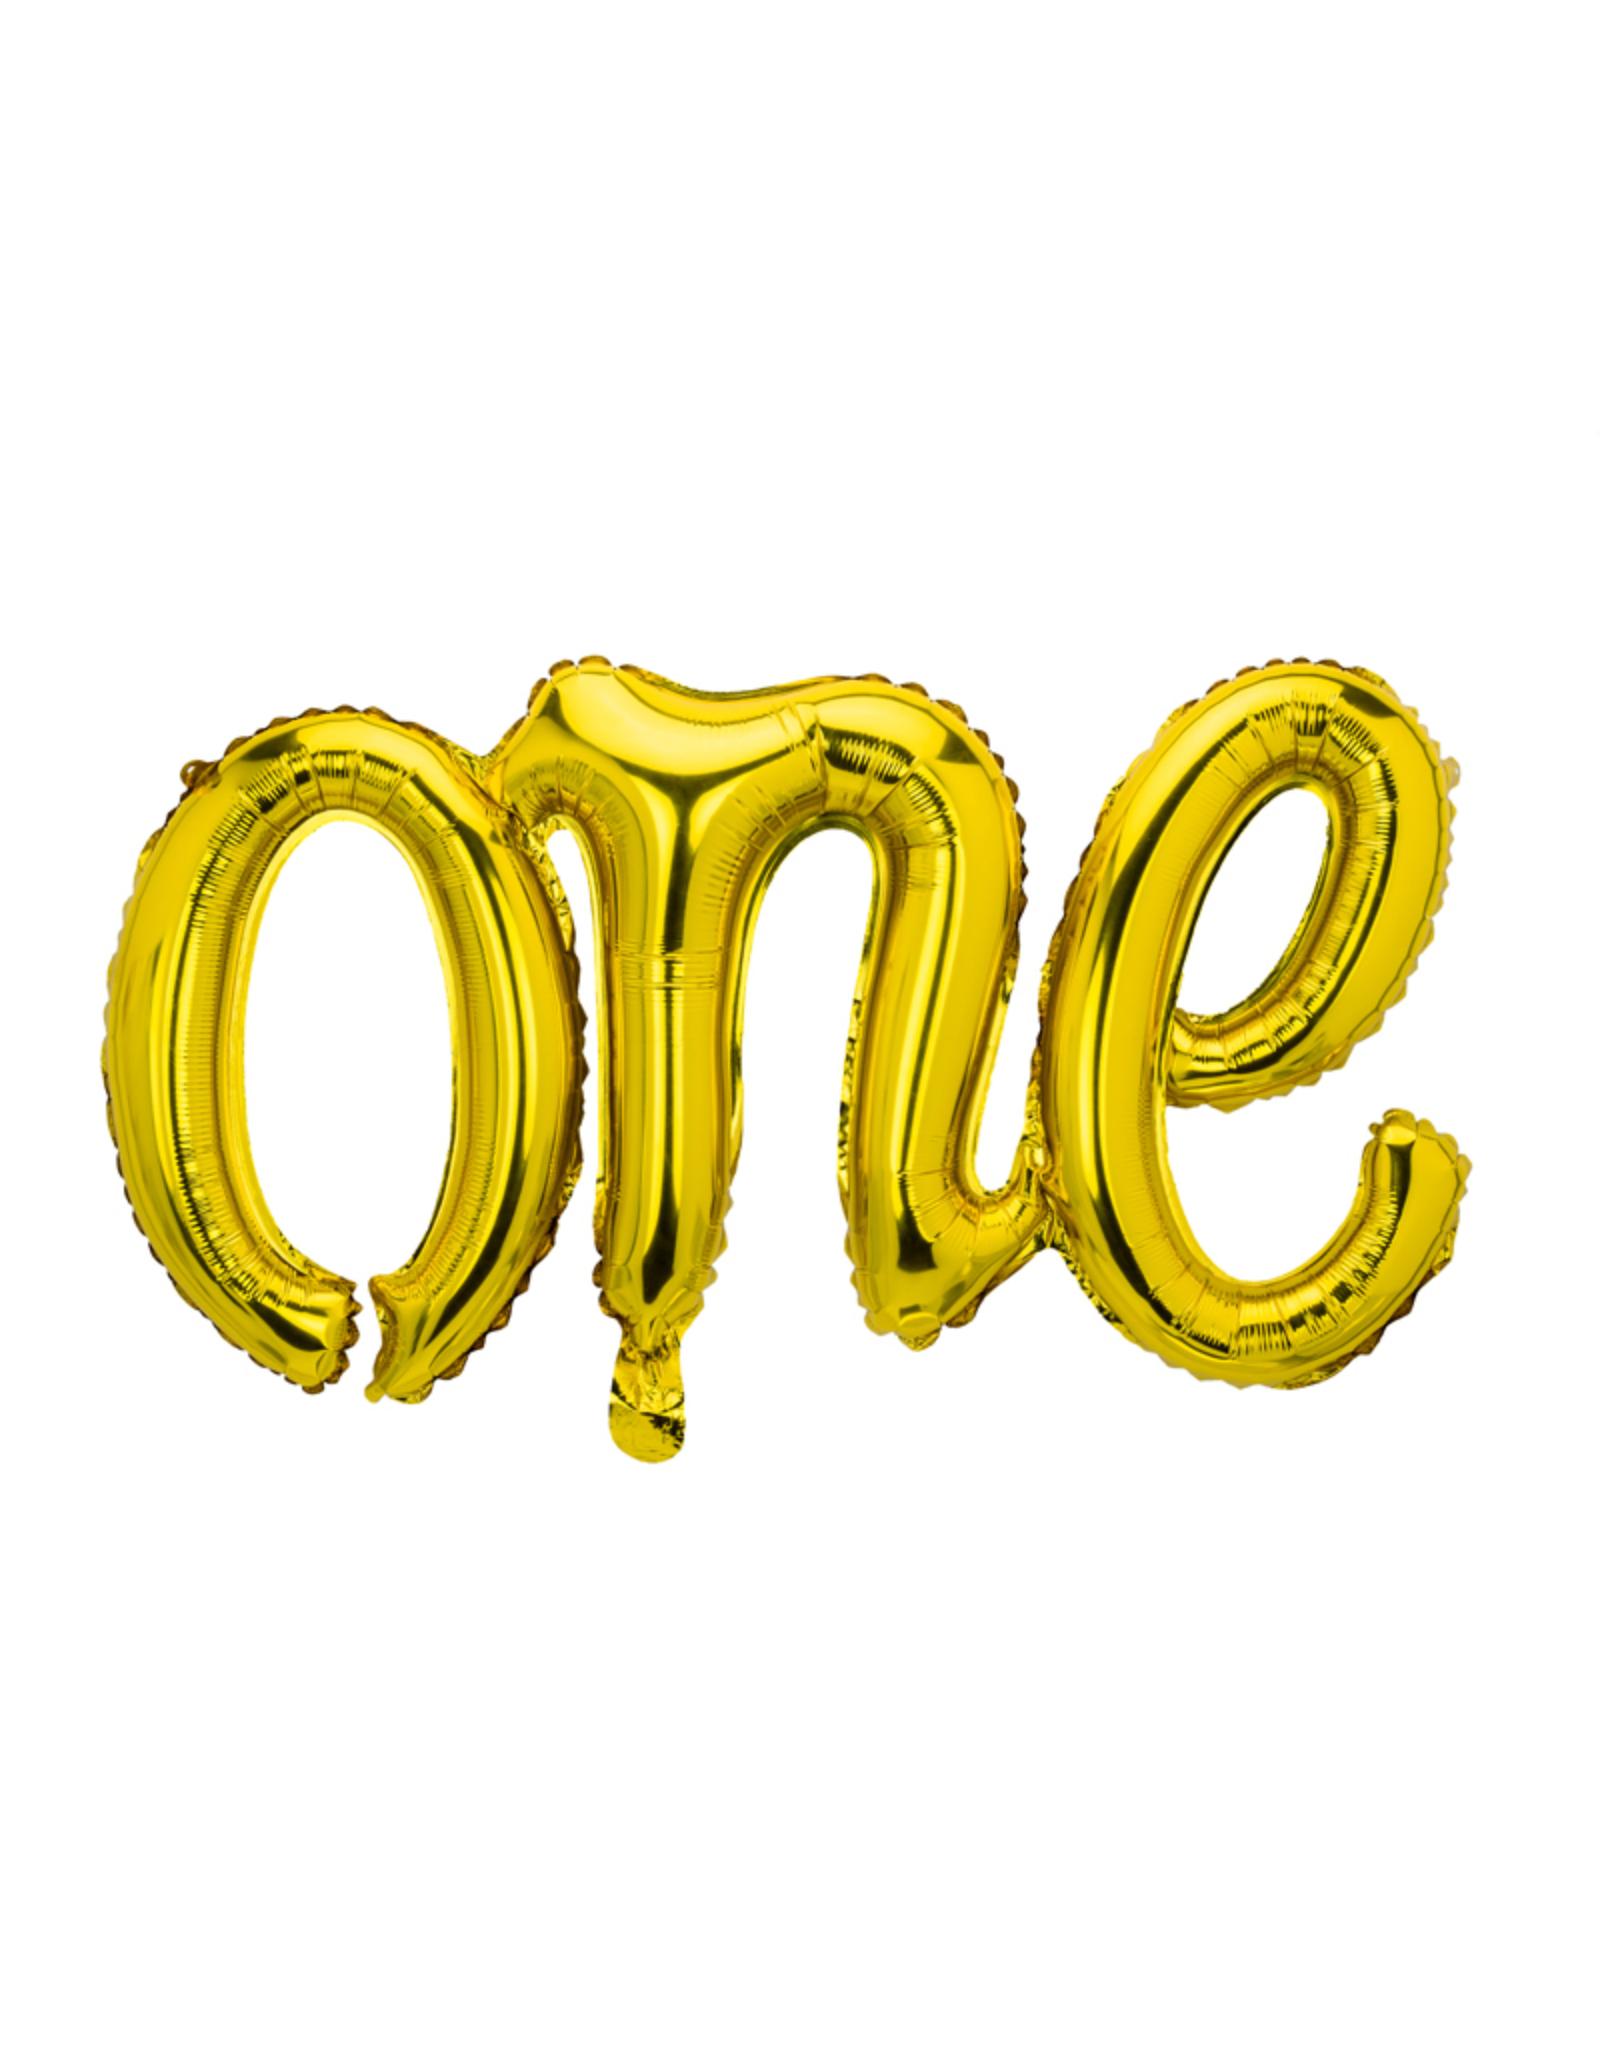 Folie ballon one